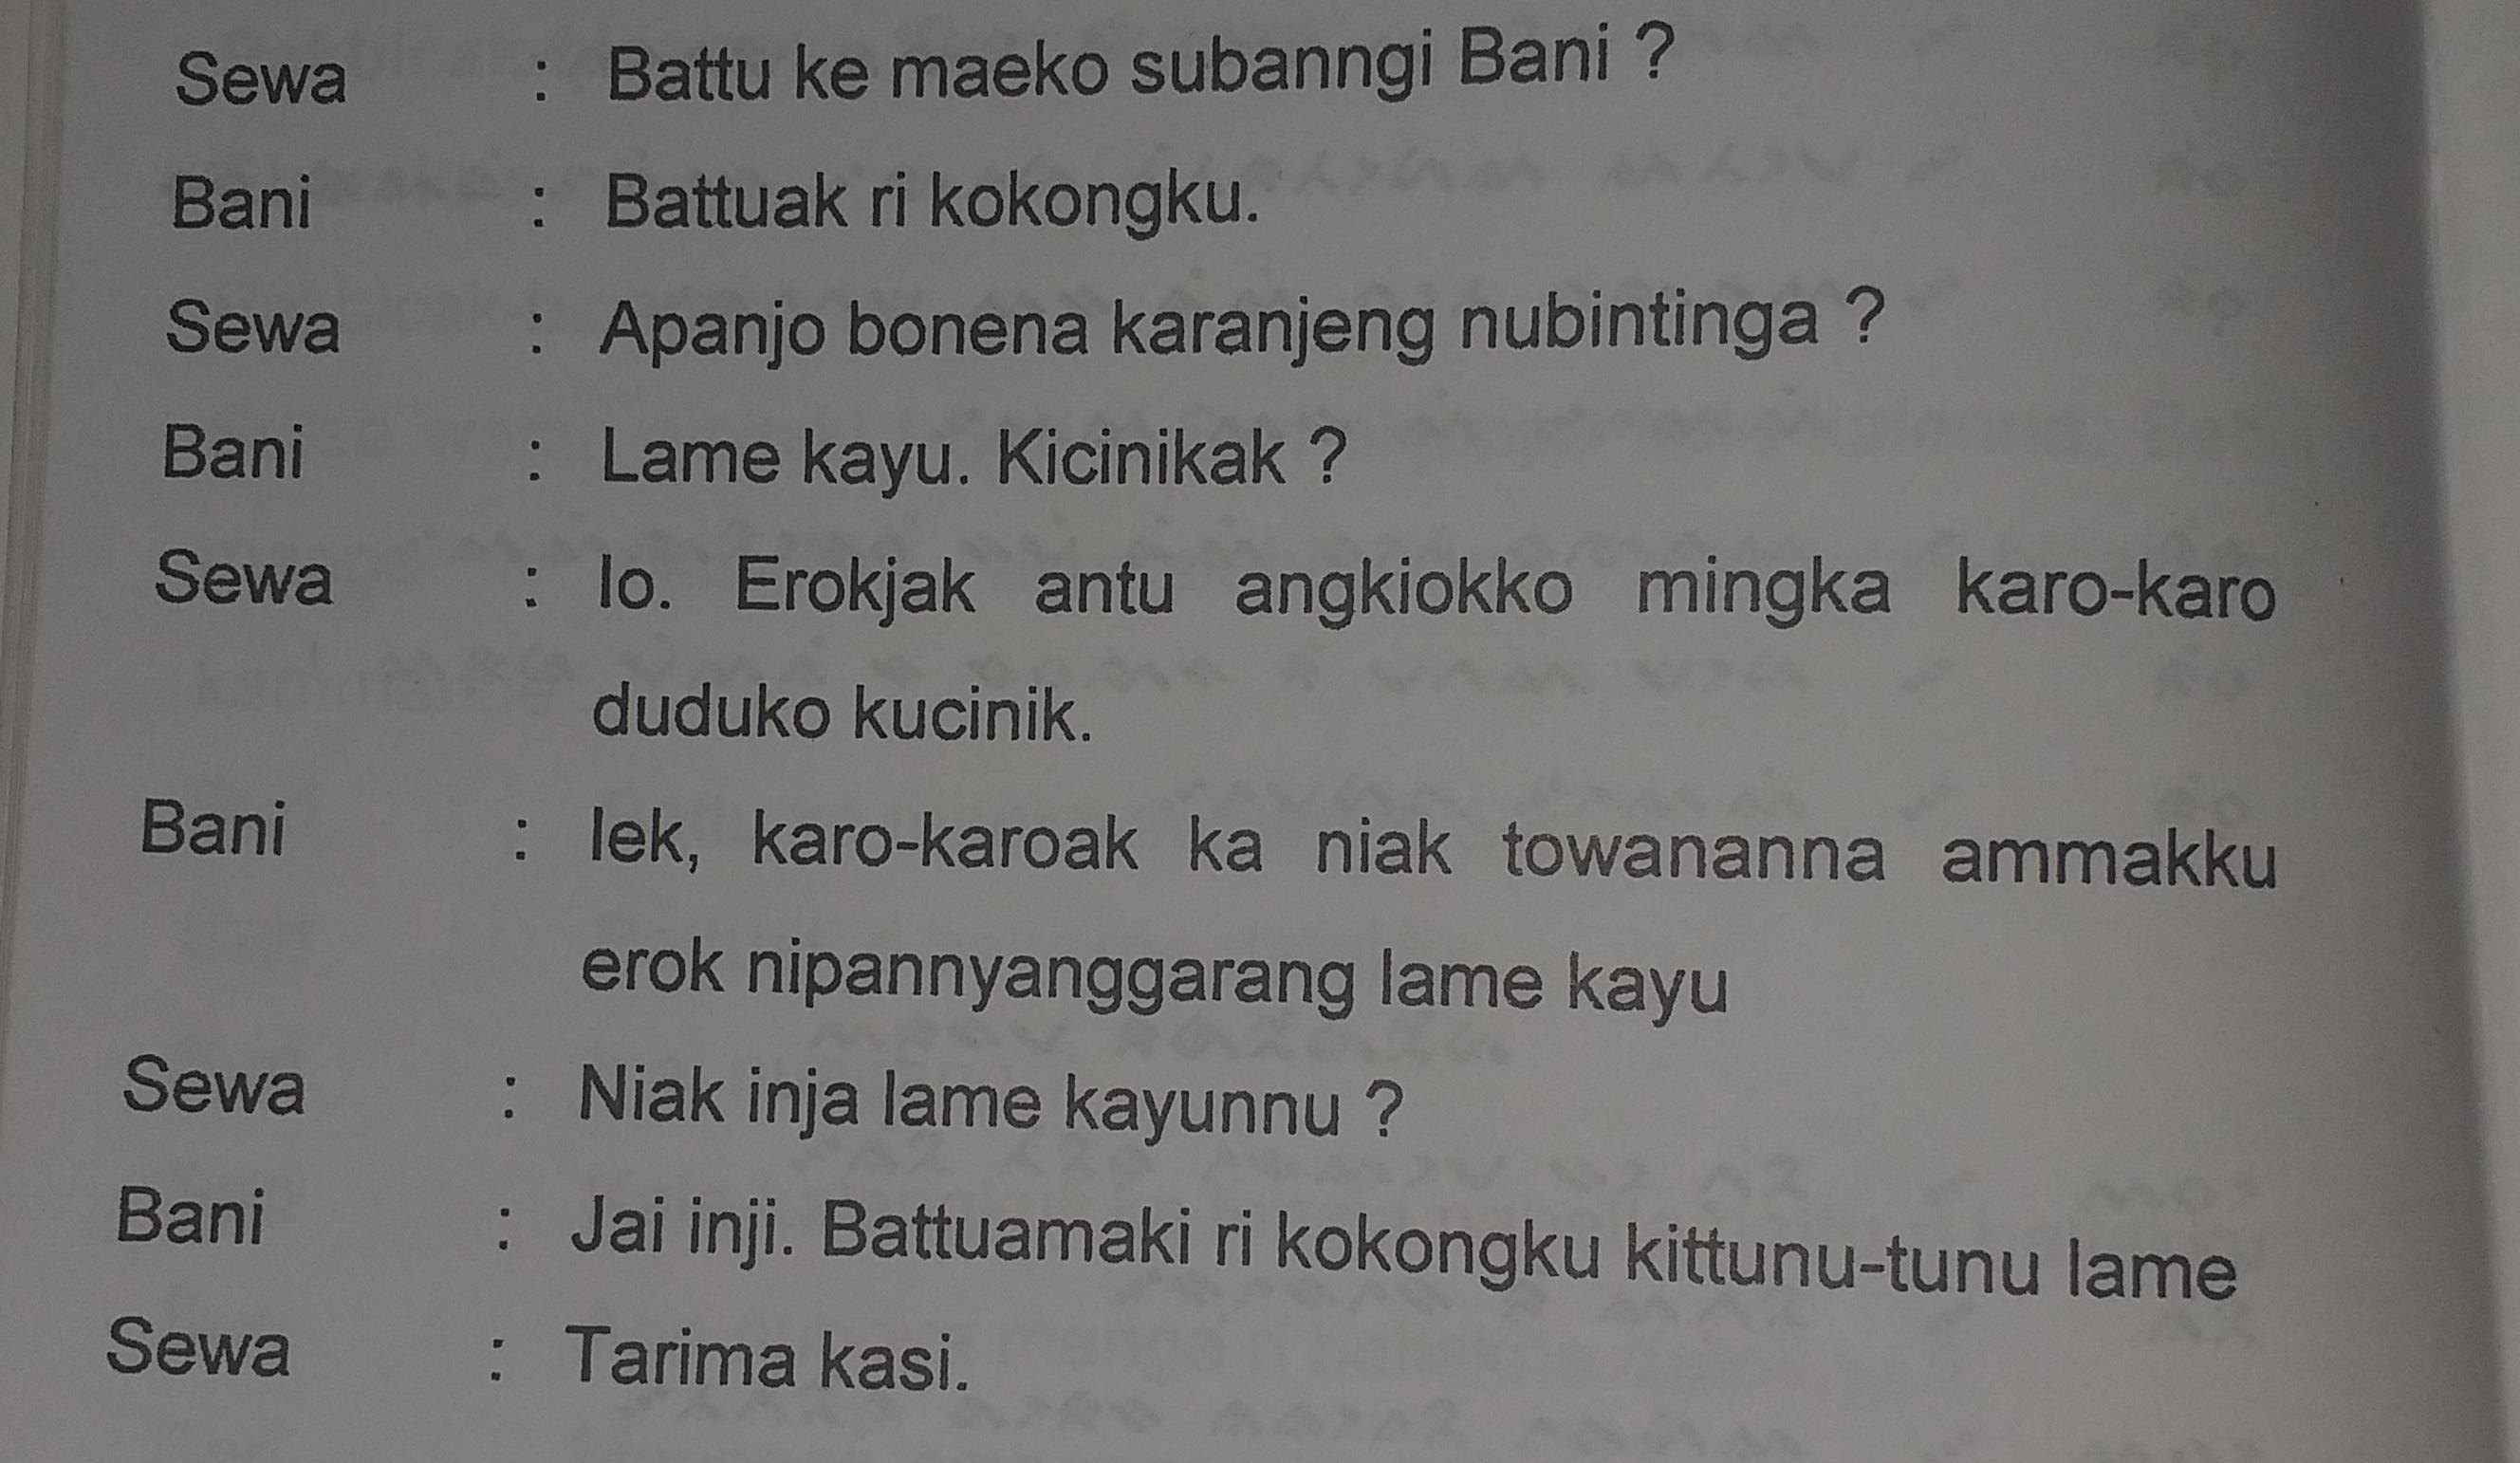 Awas Hawab Asal2 Artikan Percakapan Bahasa Makassar Menjadi Bahasa Indonesia Cepat Jawabnya Karna Brainly Co Id